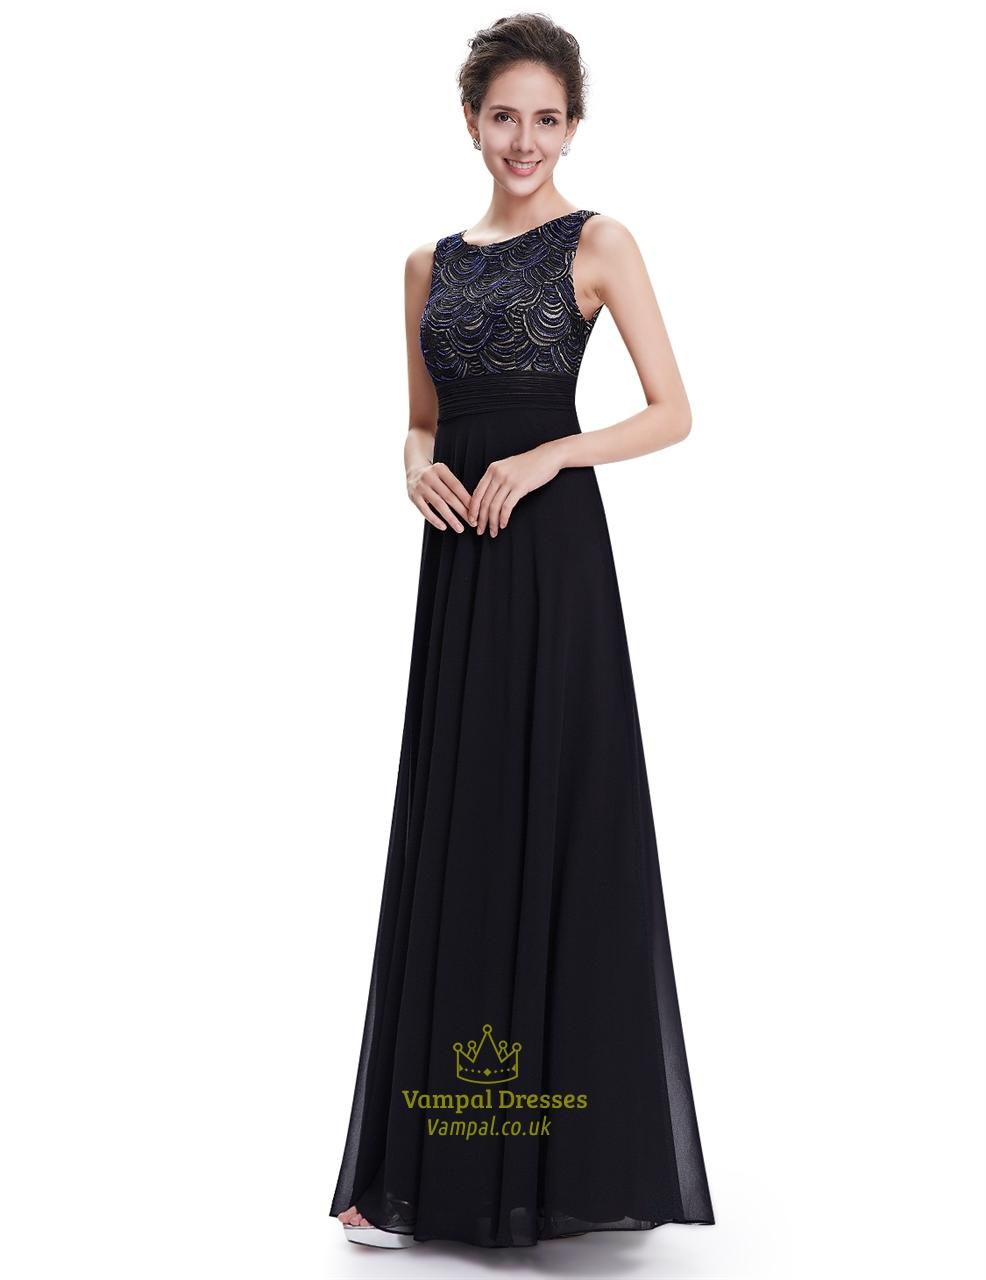 elegant black prom dresses - photo #19